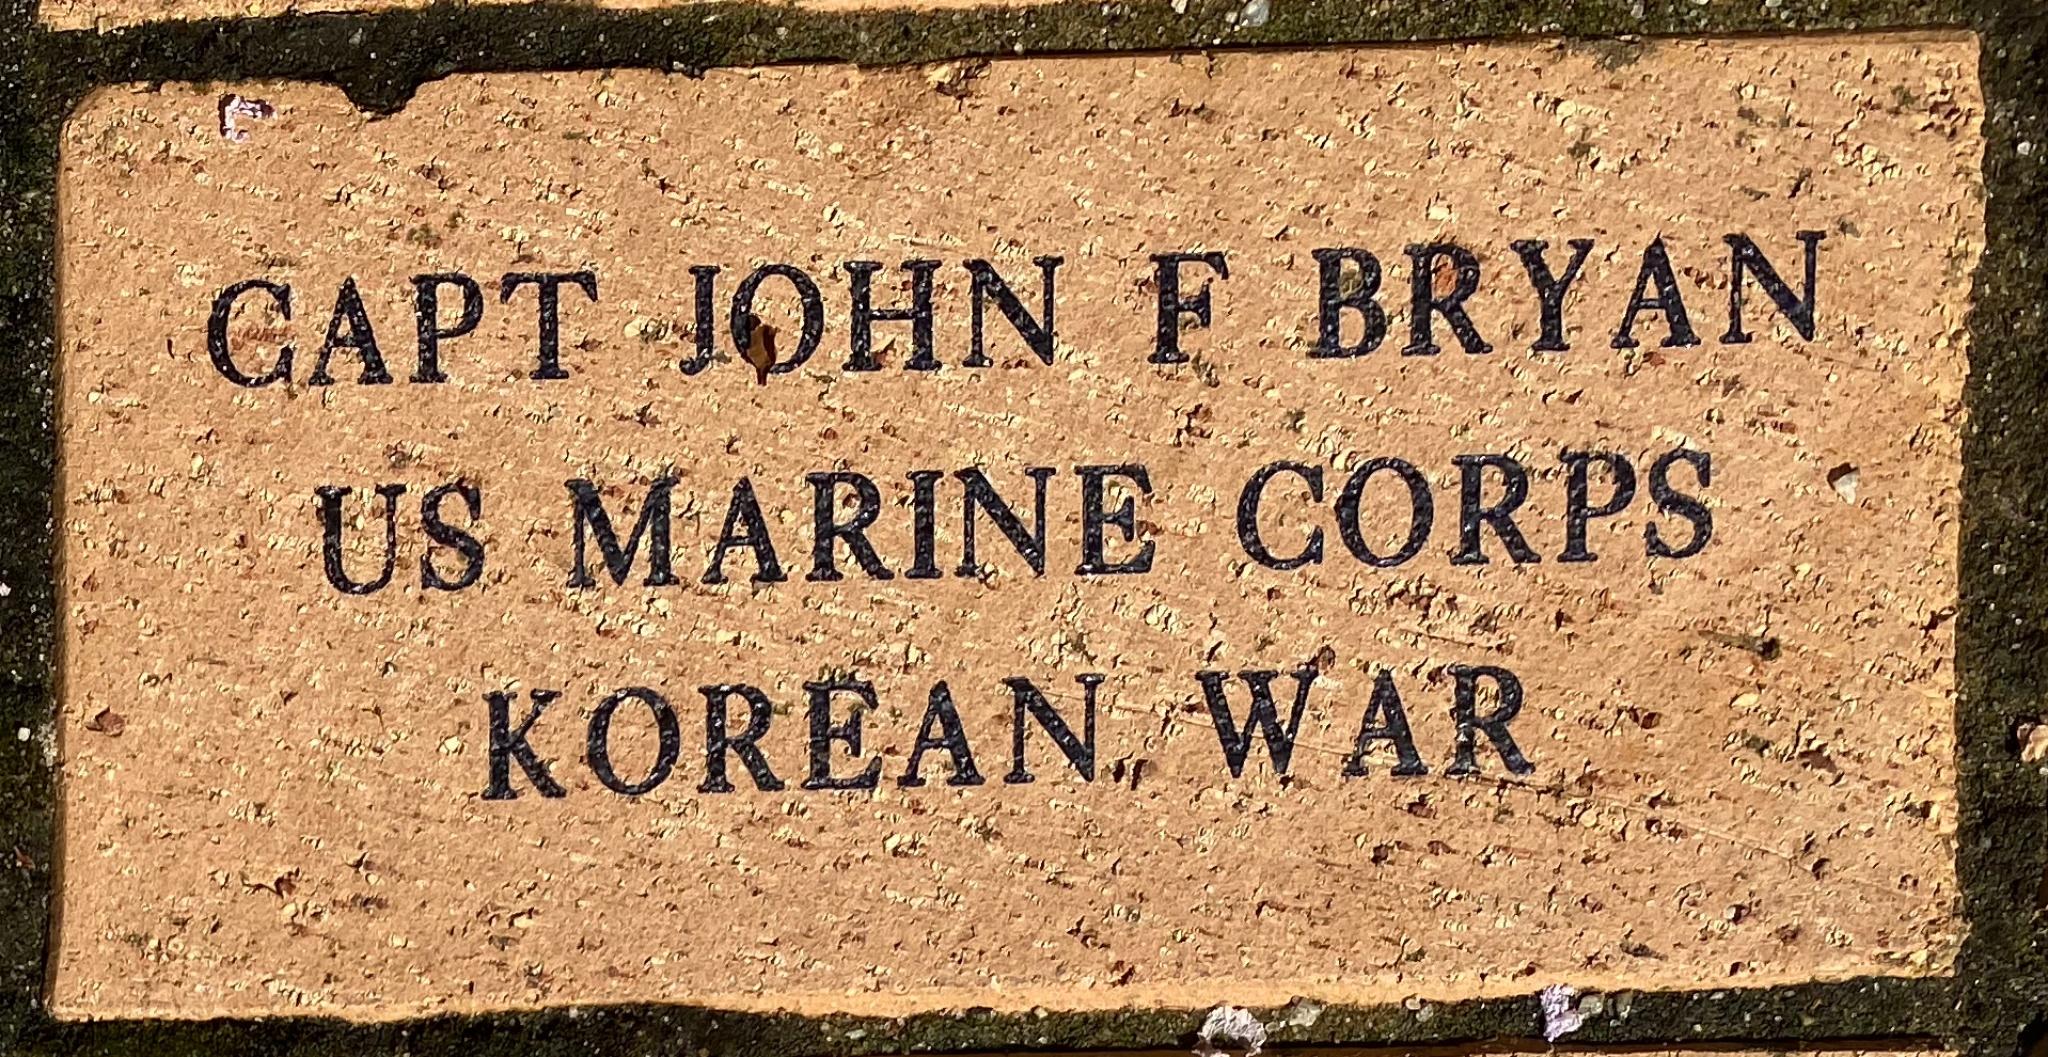 CAPT JOHN F BRYAN US MARINE CORPS KOREAN WAR